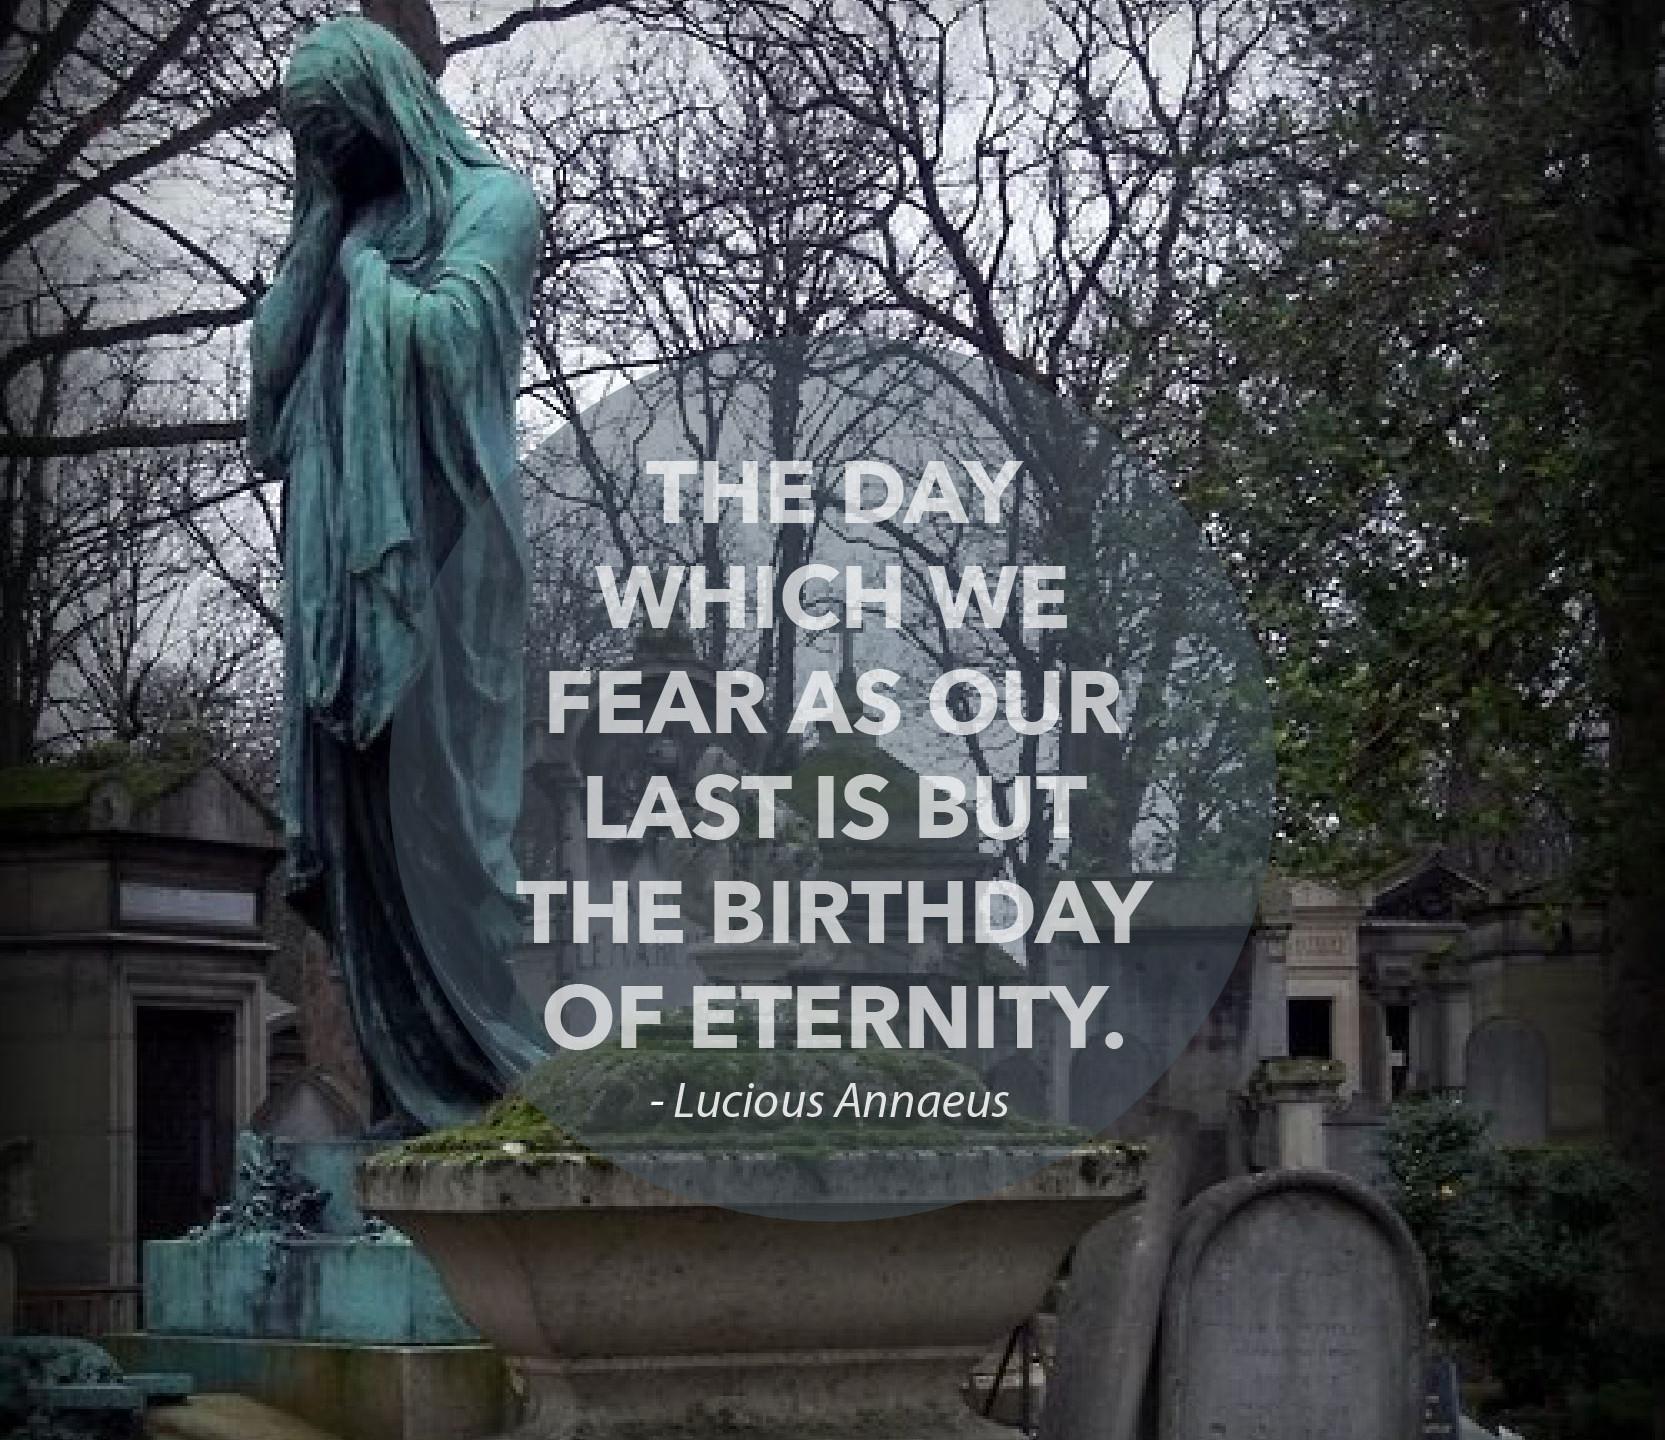 B-day-of-eternity-myowneulogy